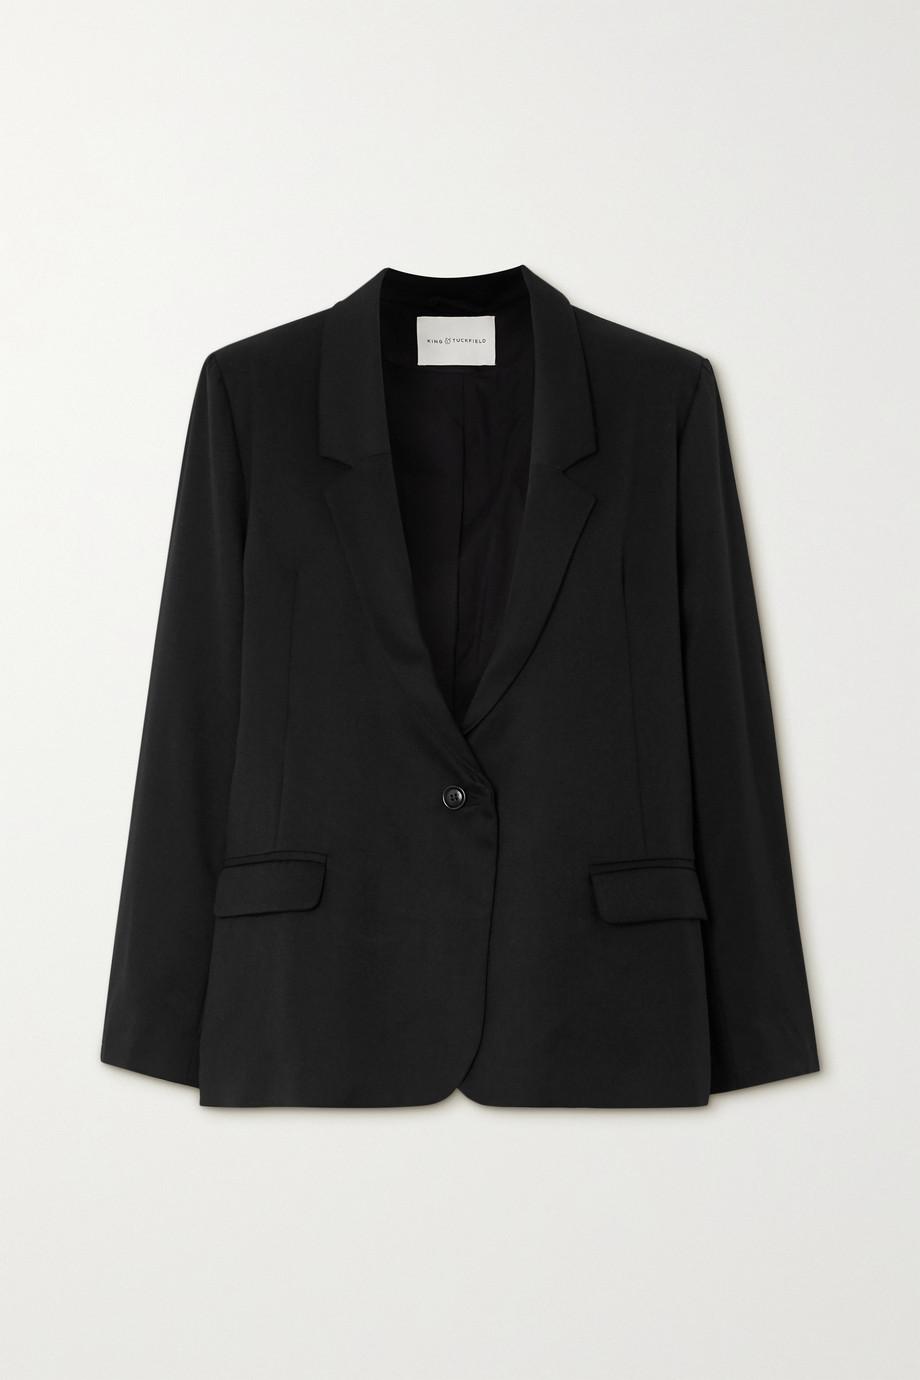 King & Tuckfield 羊毛斜纹布西装外套